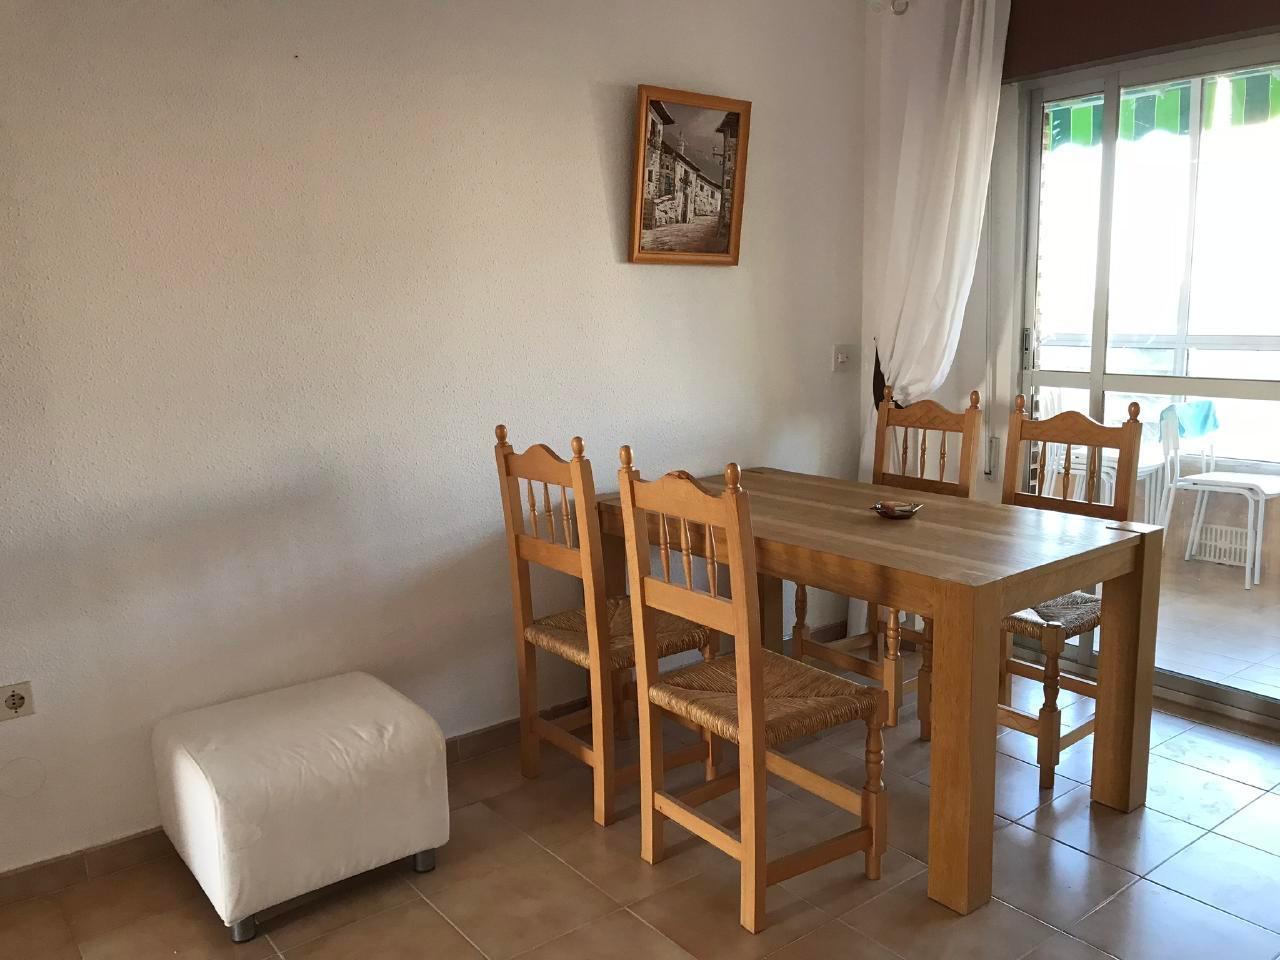 Appartement de vacances Sonnige 3.5 Zi-Wohnung am Meer (1026876), Torrevieja, Costa Blanca, Valence, Espagne, image 7